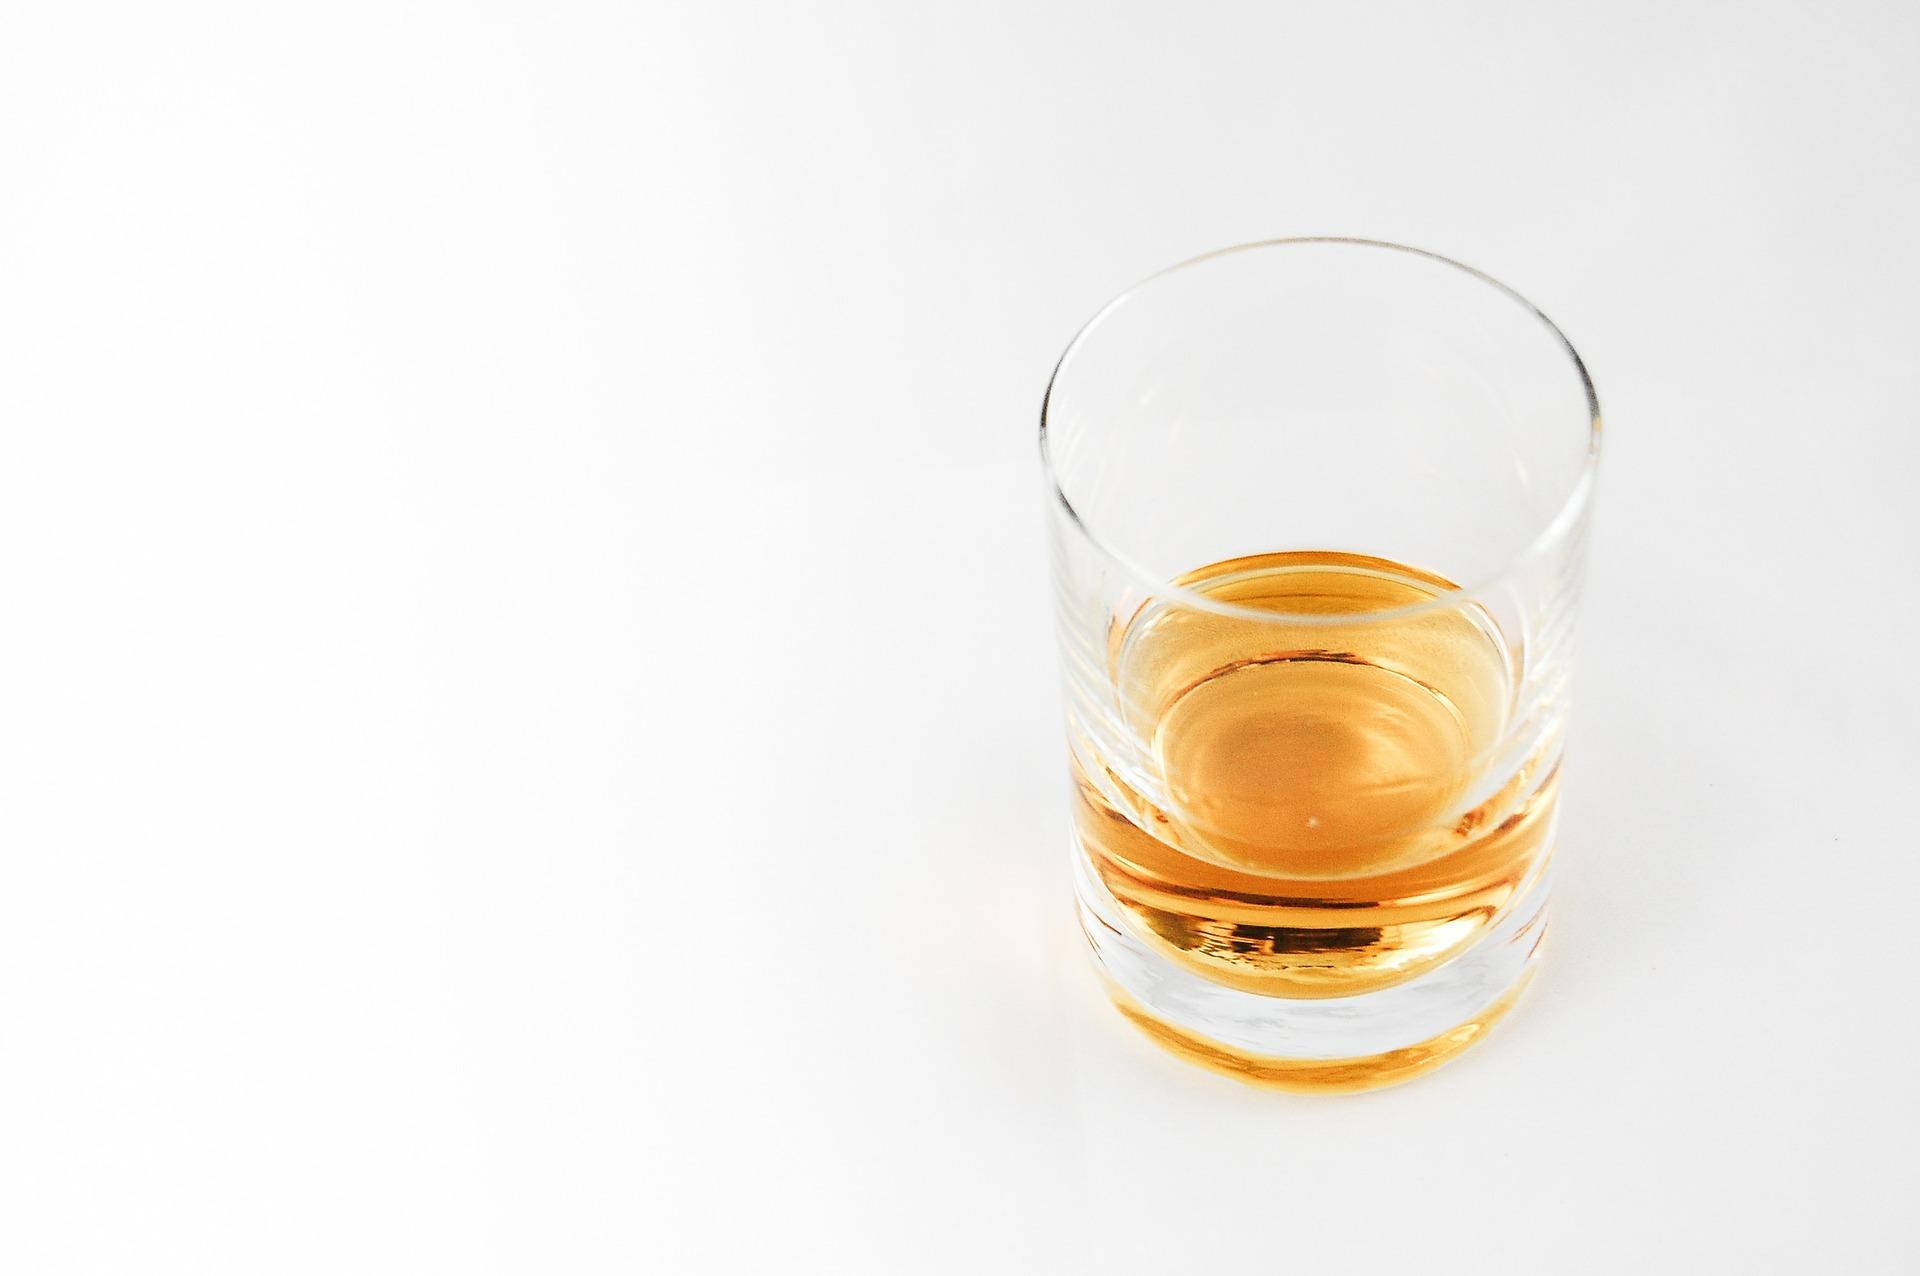 alcohol drink, methadose